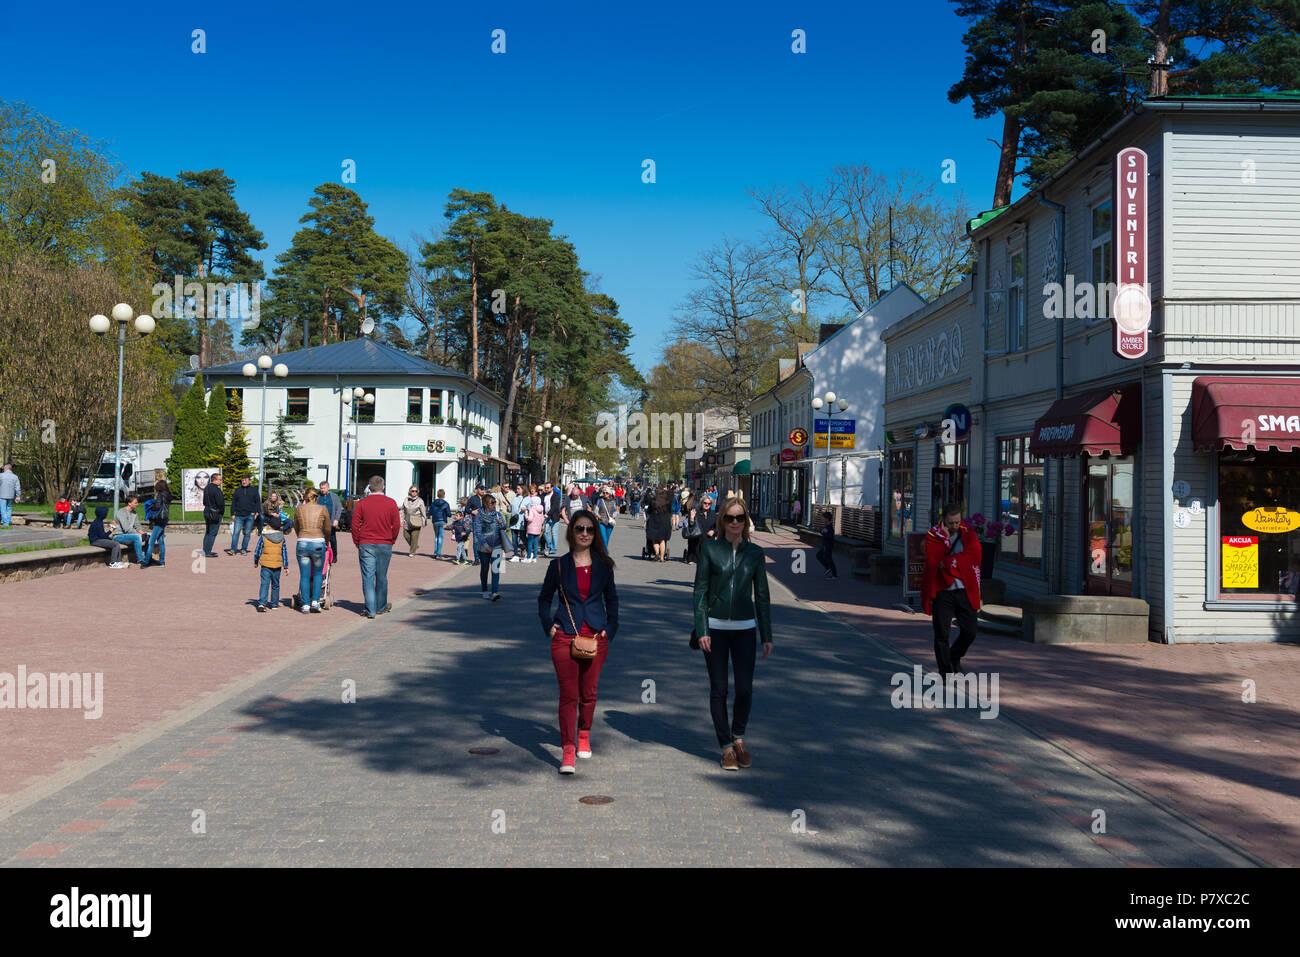 Tourists walking in Jomas Iela street, Jurmala, Latvia - Stock Image